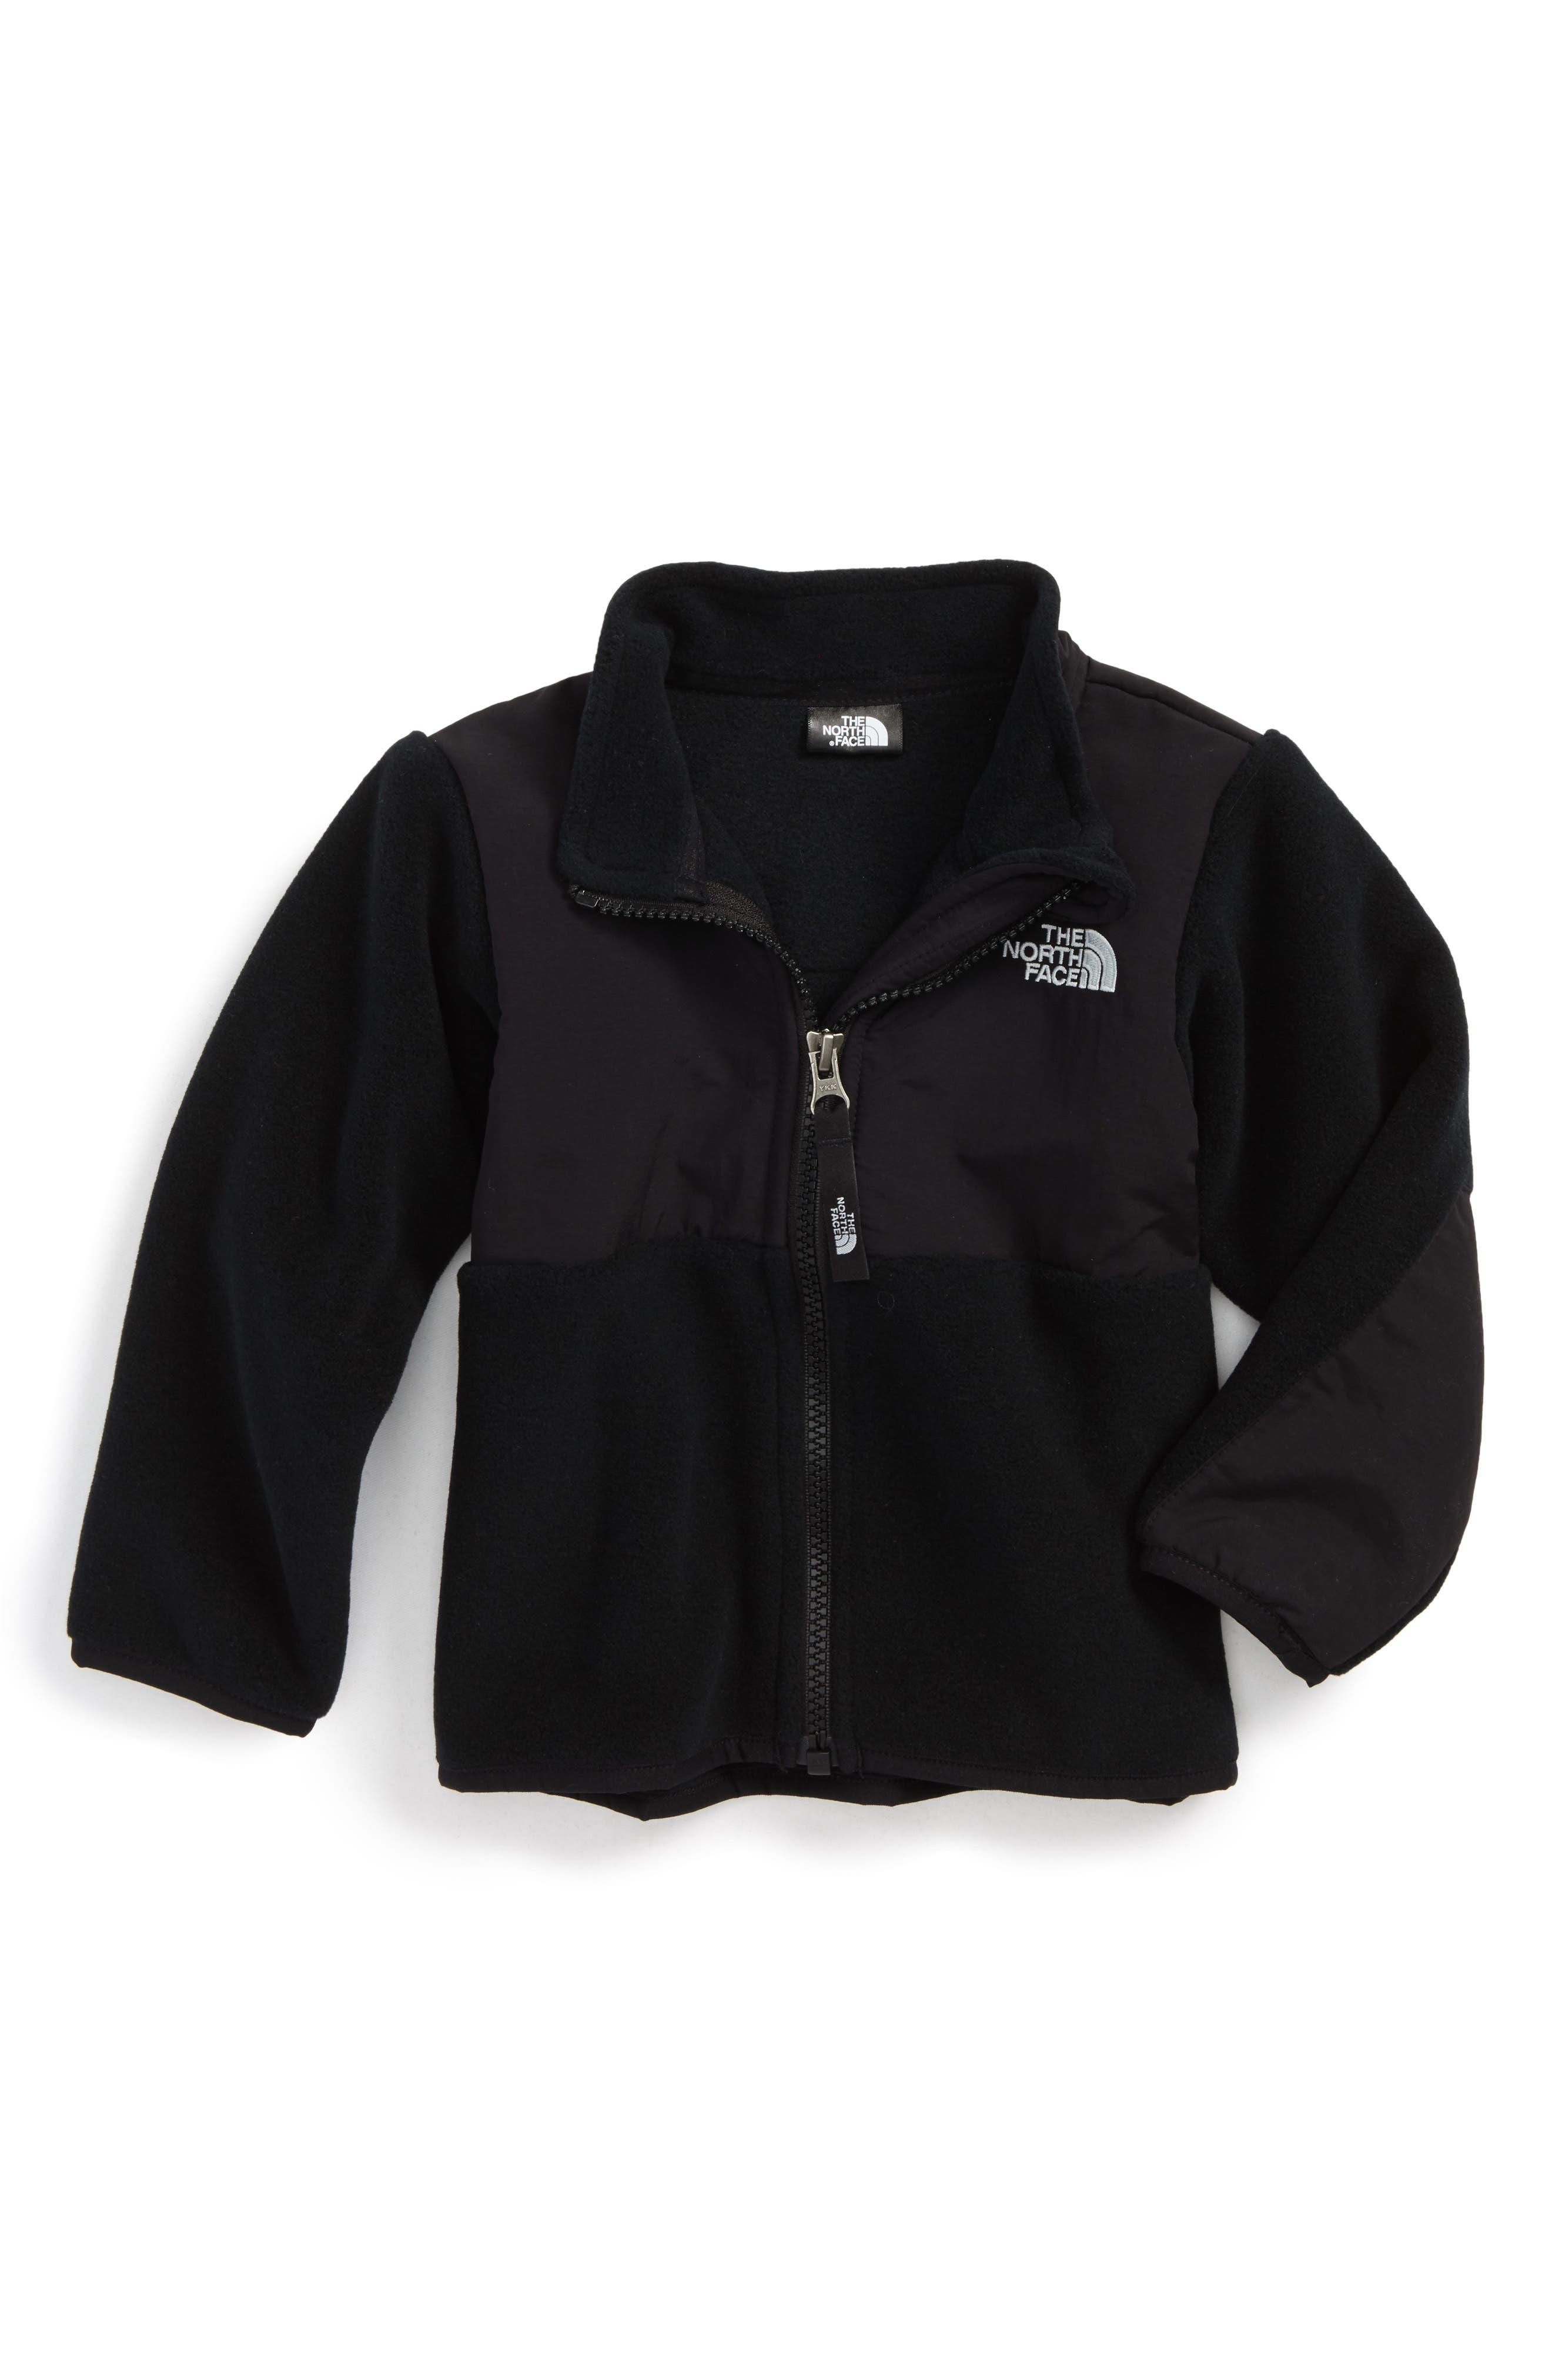 Denali Recycled Fleece Jacket,                             Main thumbnail 1, color,                             TNF BLACK